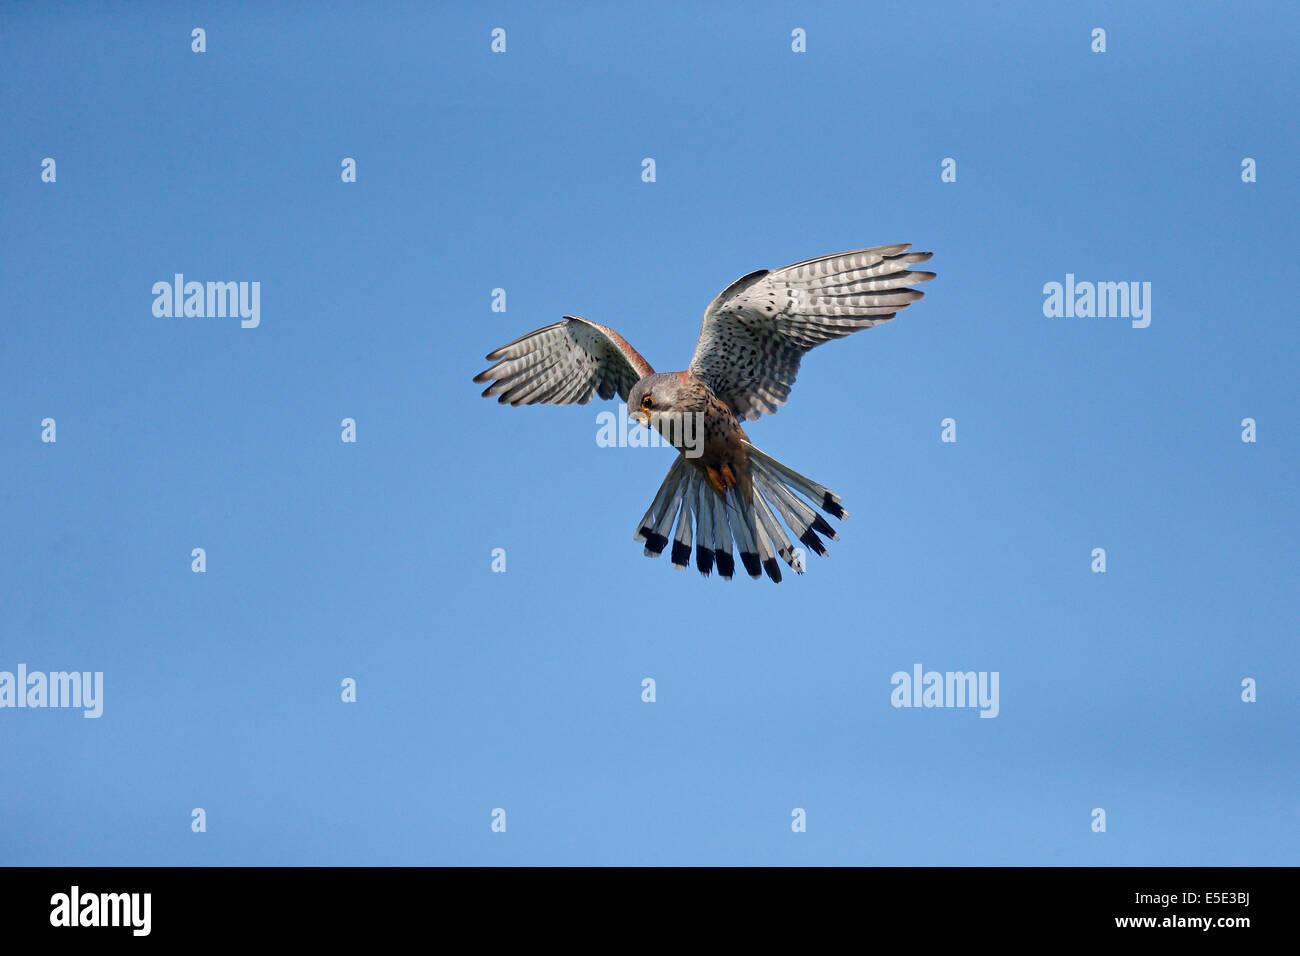 Kestrel, Falco tinnunculus, single male hovering, Warwickshire, May 2014 - Stock Image